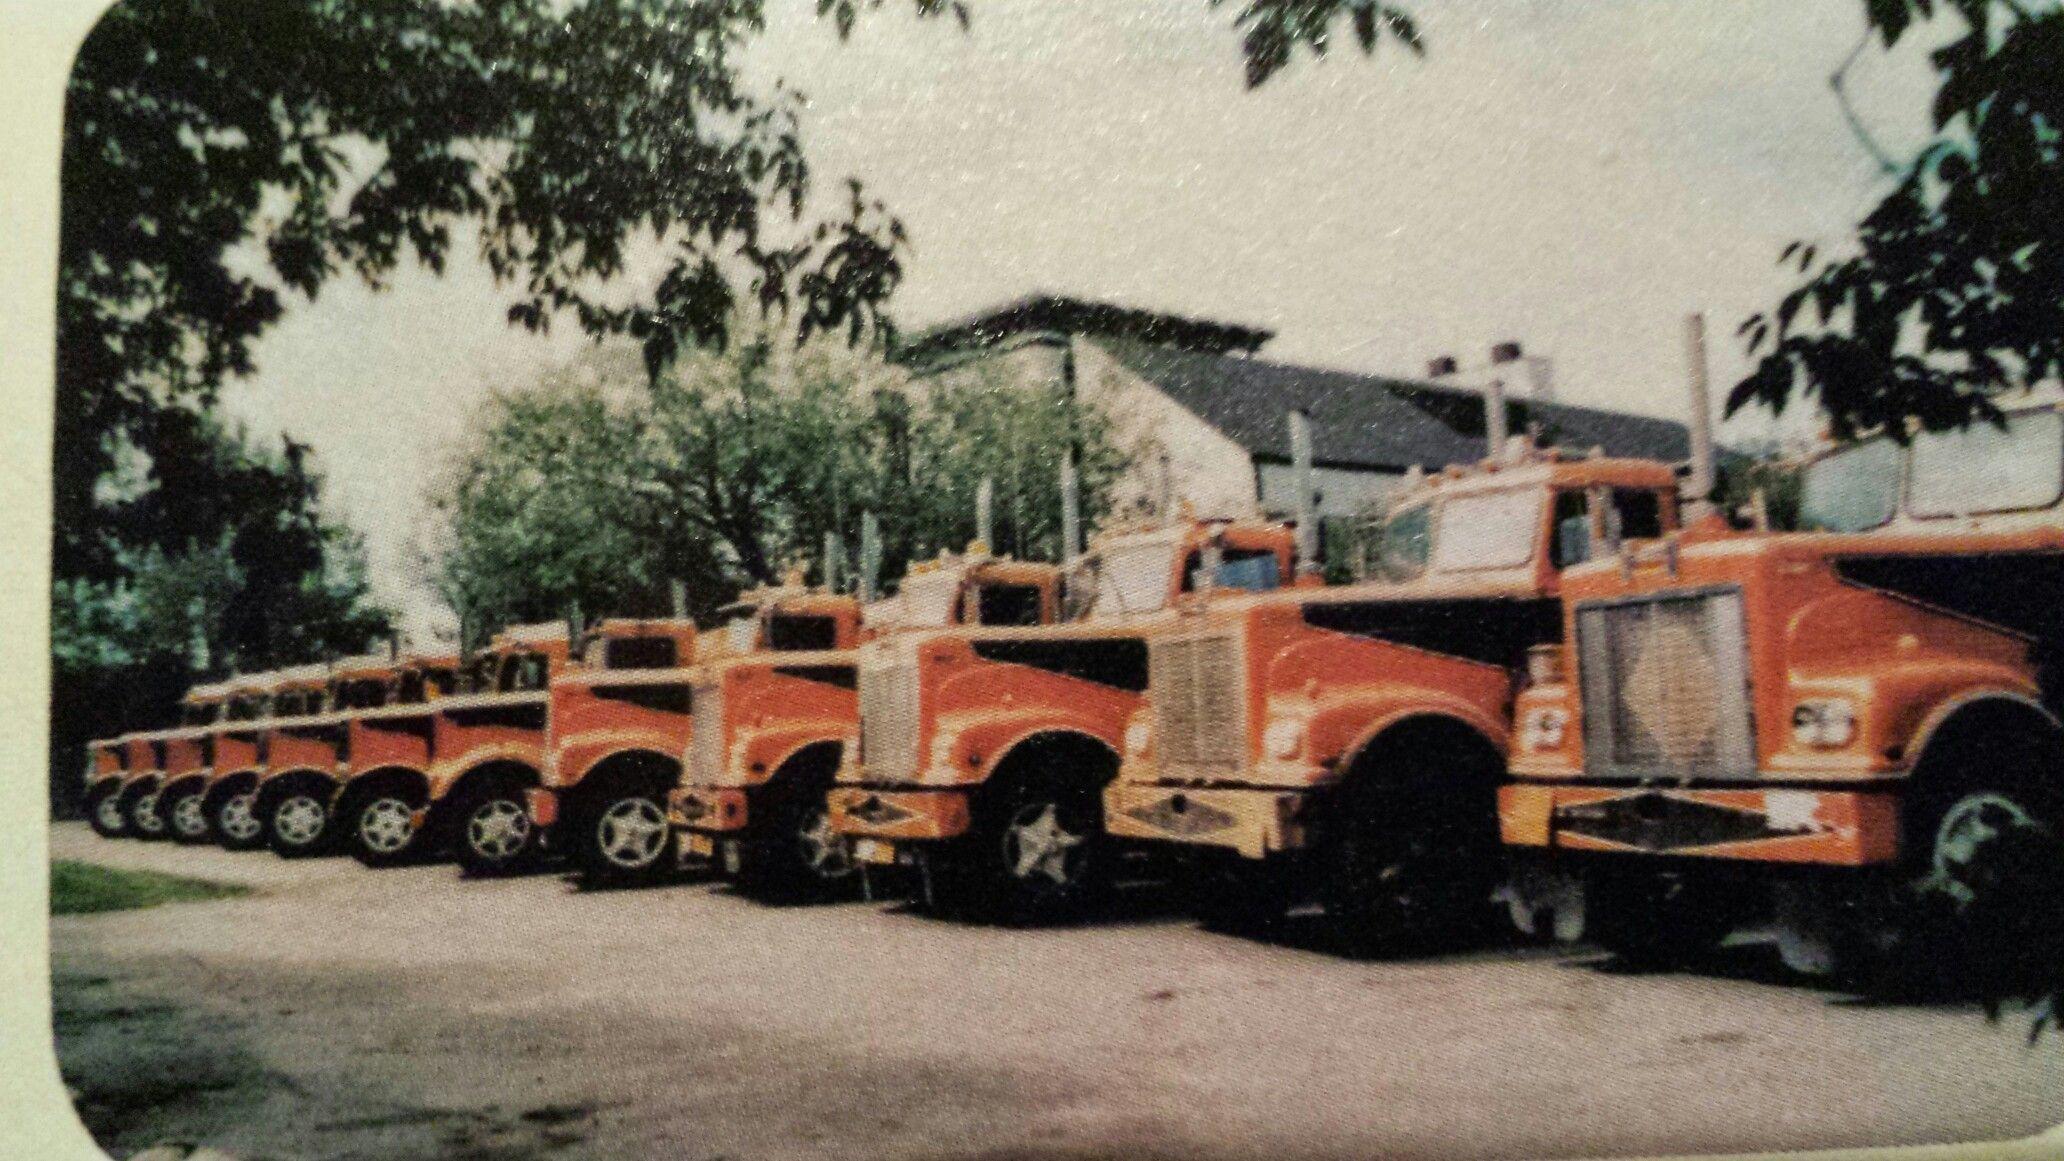 Northline Transport Edmonton Alberta Aprox 1975 Big Rig Trucks Big Trucks Cars Trucks